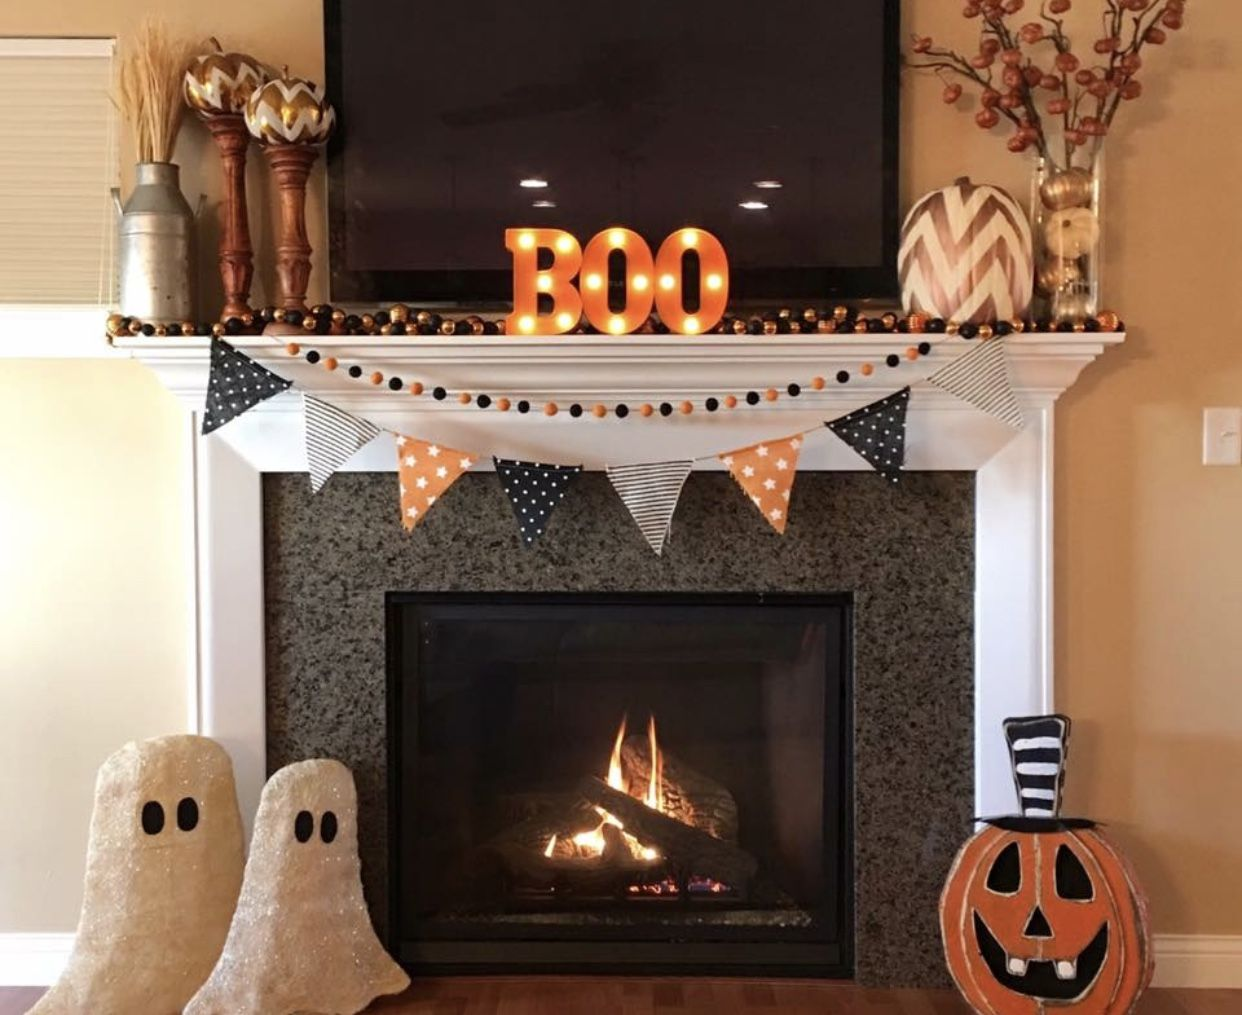 Pin by Mariah Morrison on Halloween Halloween mantel